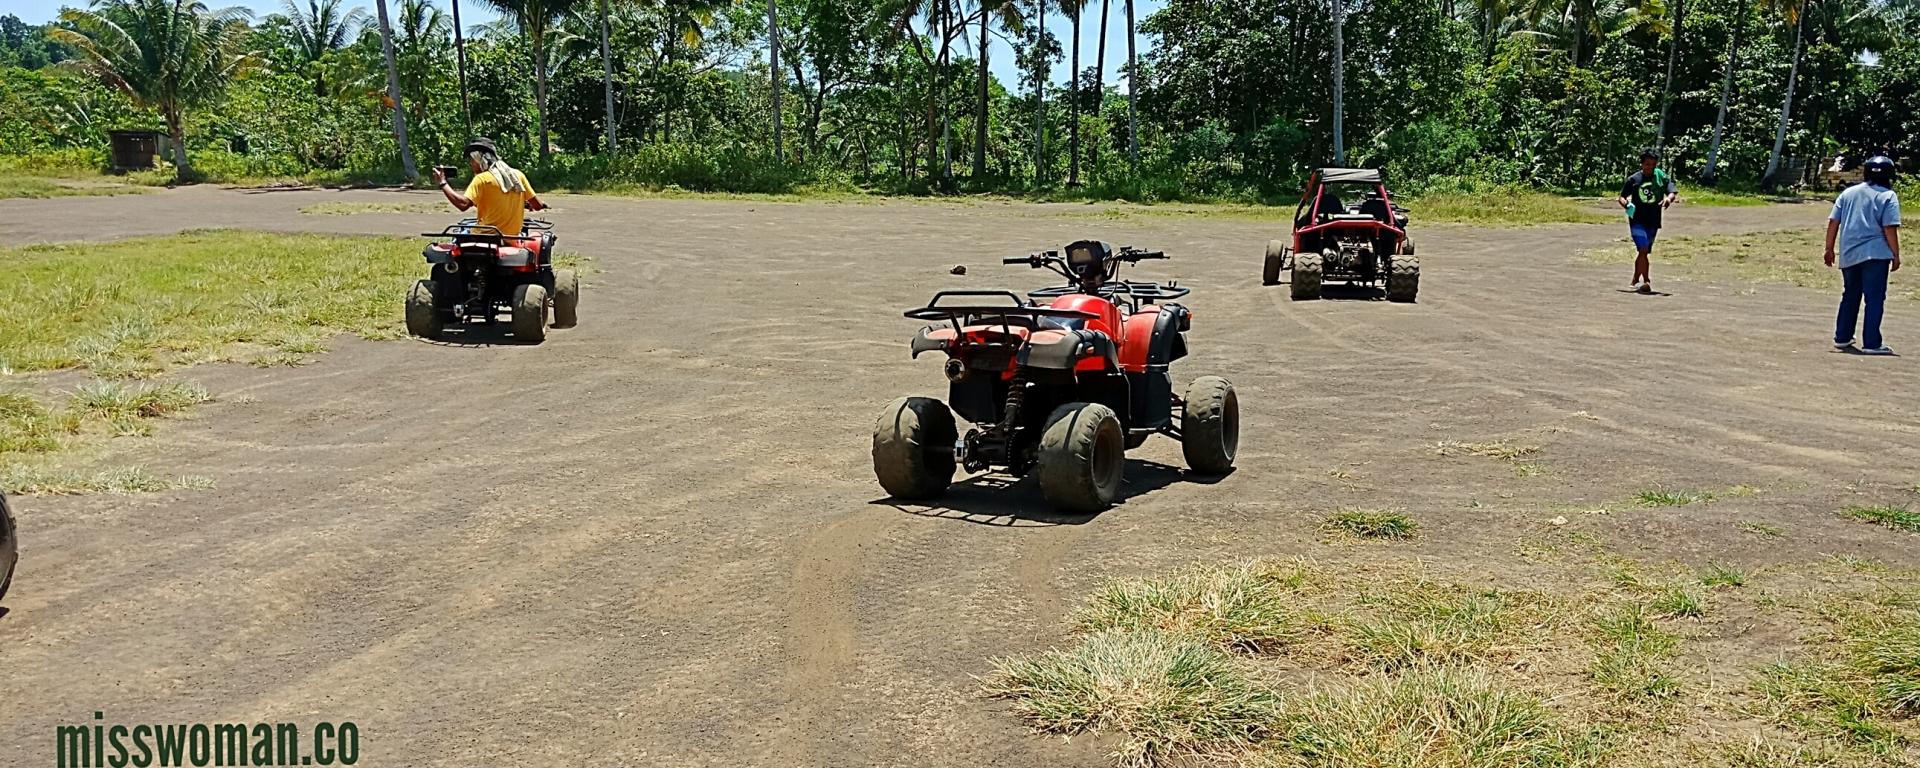 ATV Ride in Chocolate Hills, Bohol